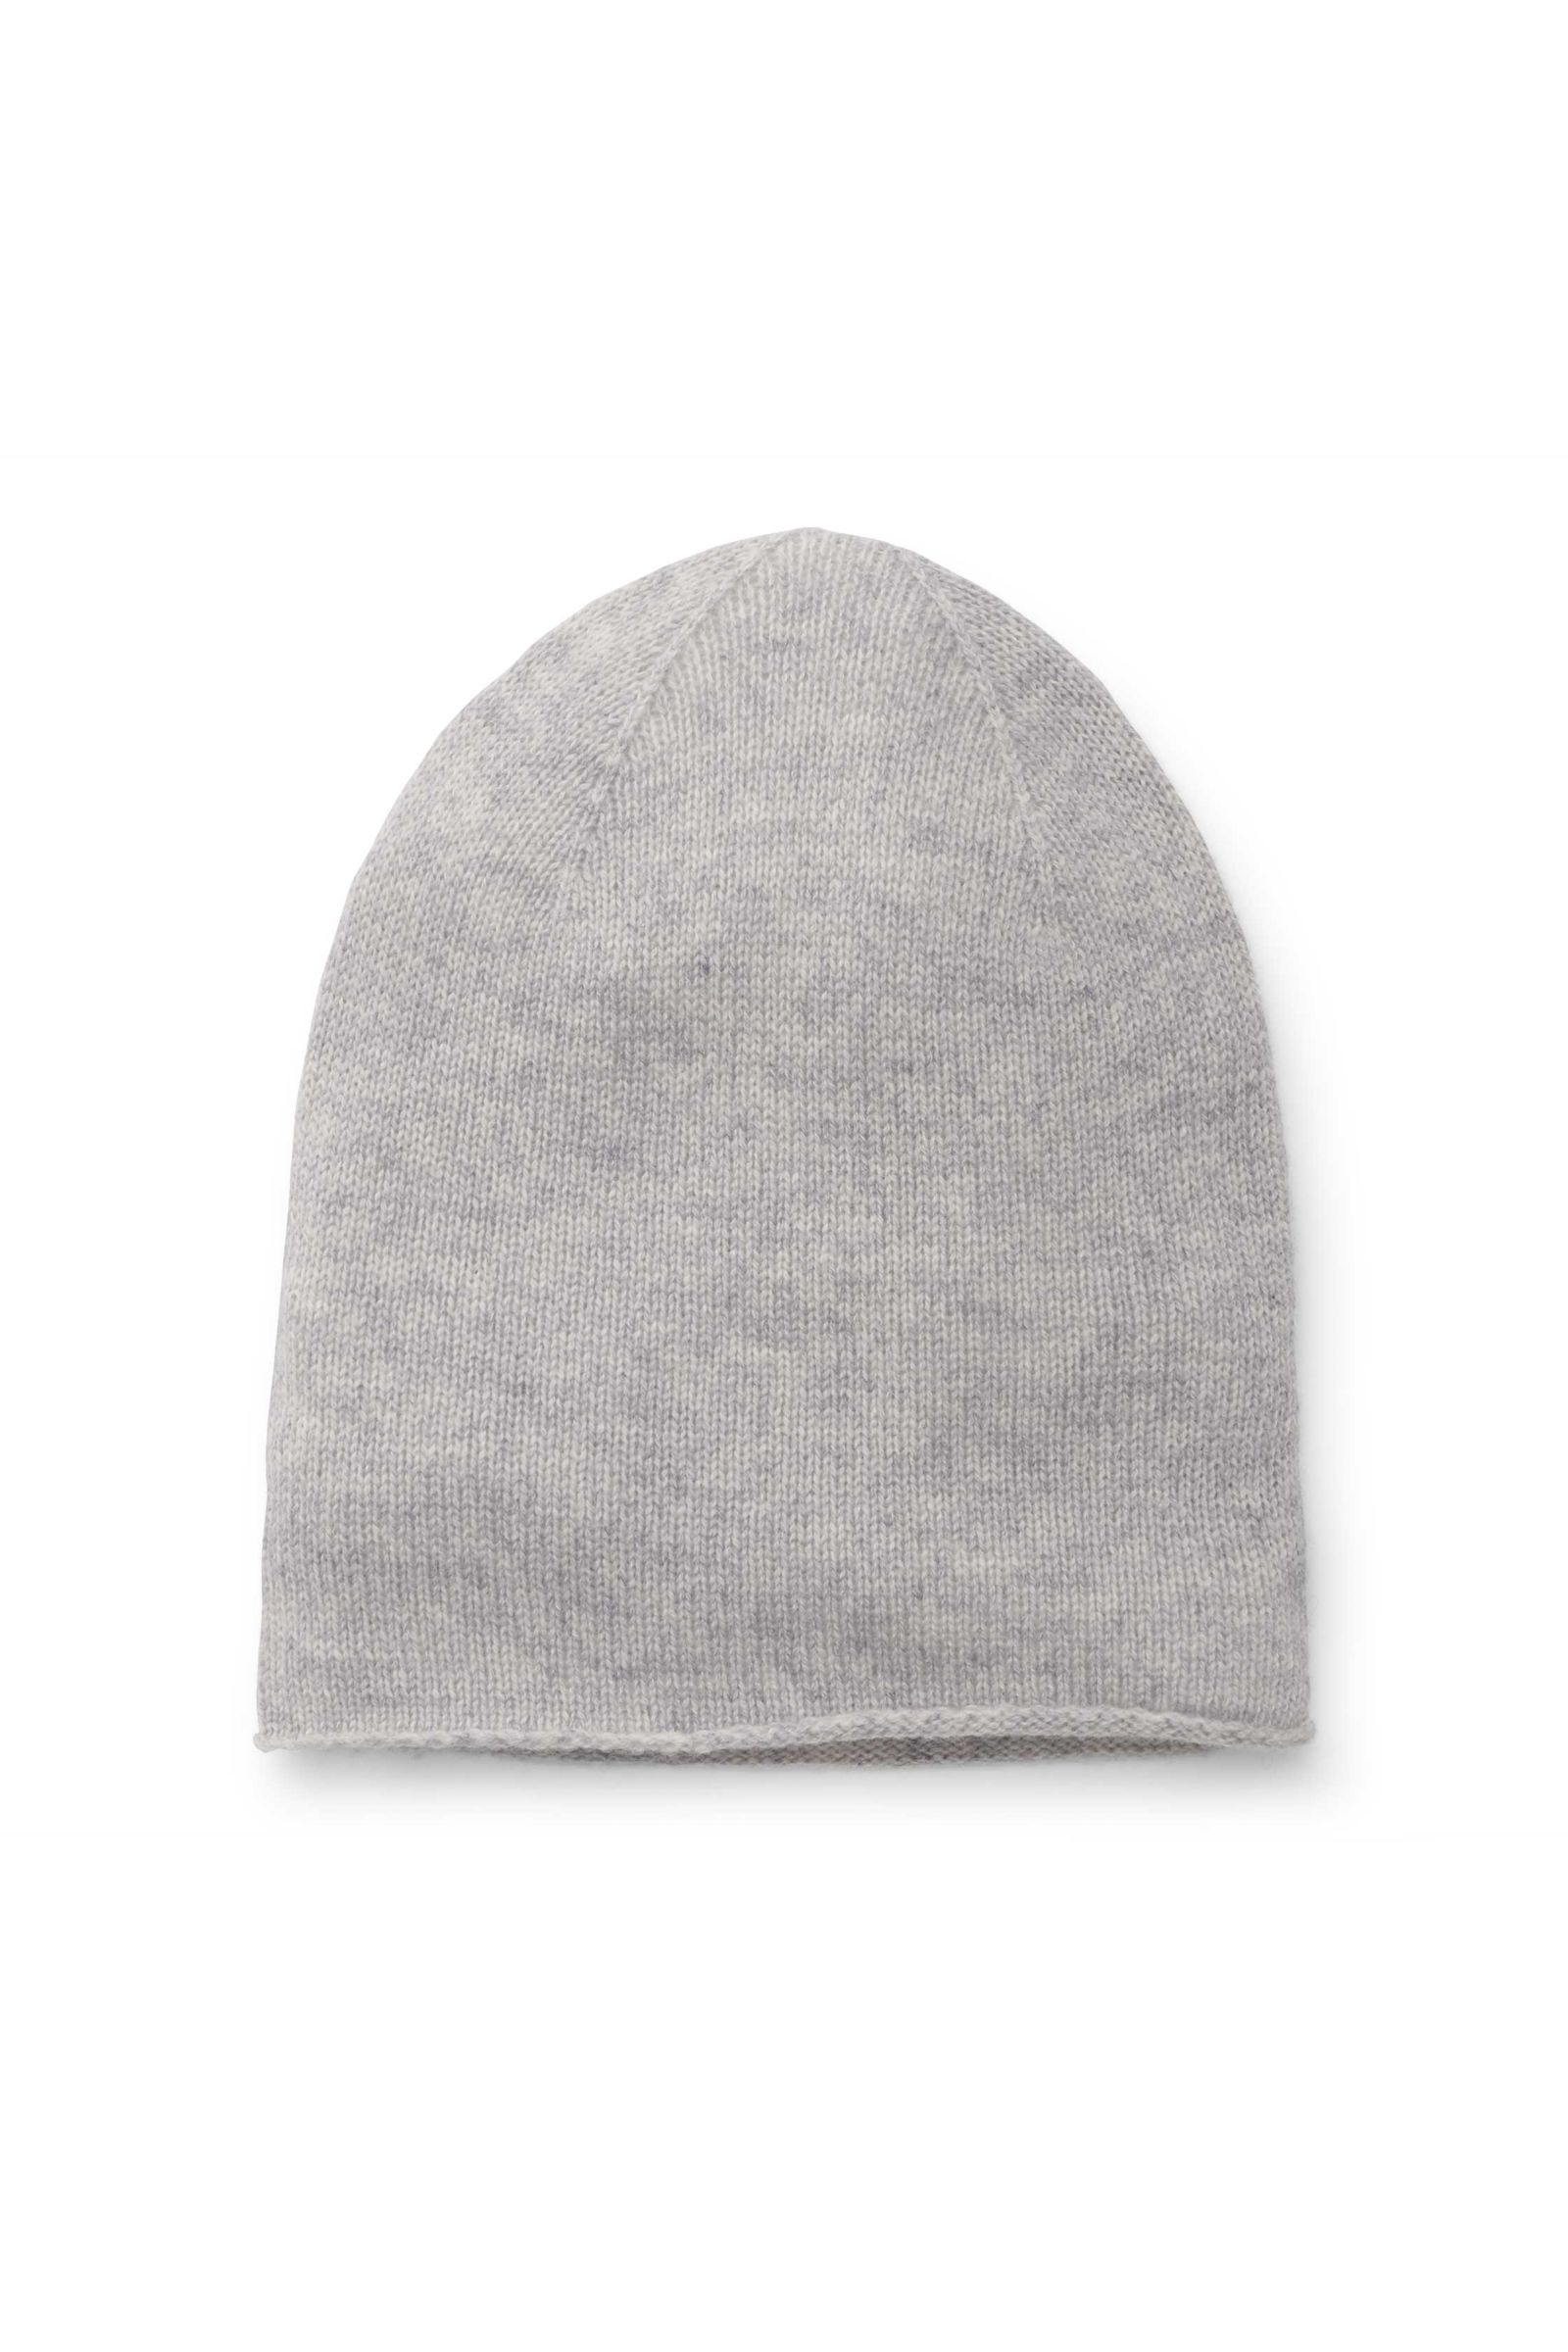 Kinder Cashmere Mütze hellgrau